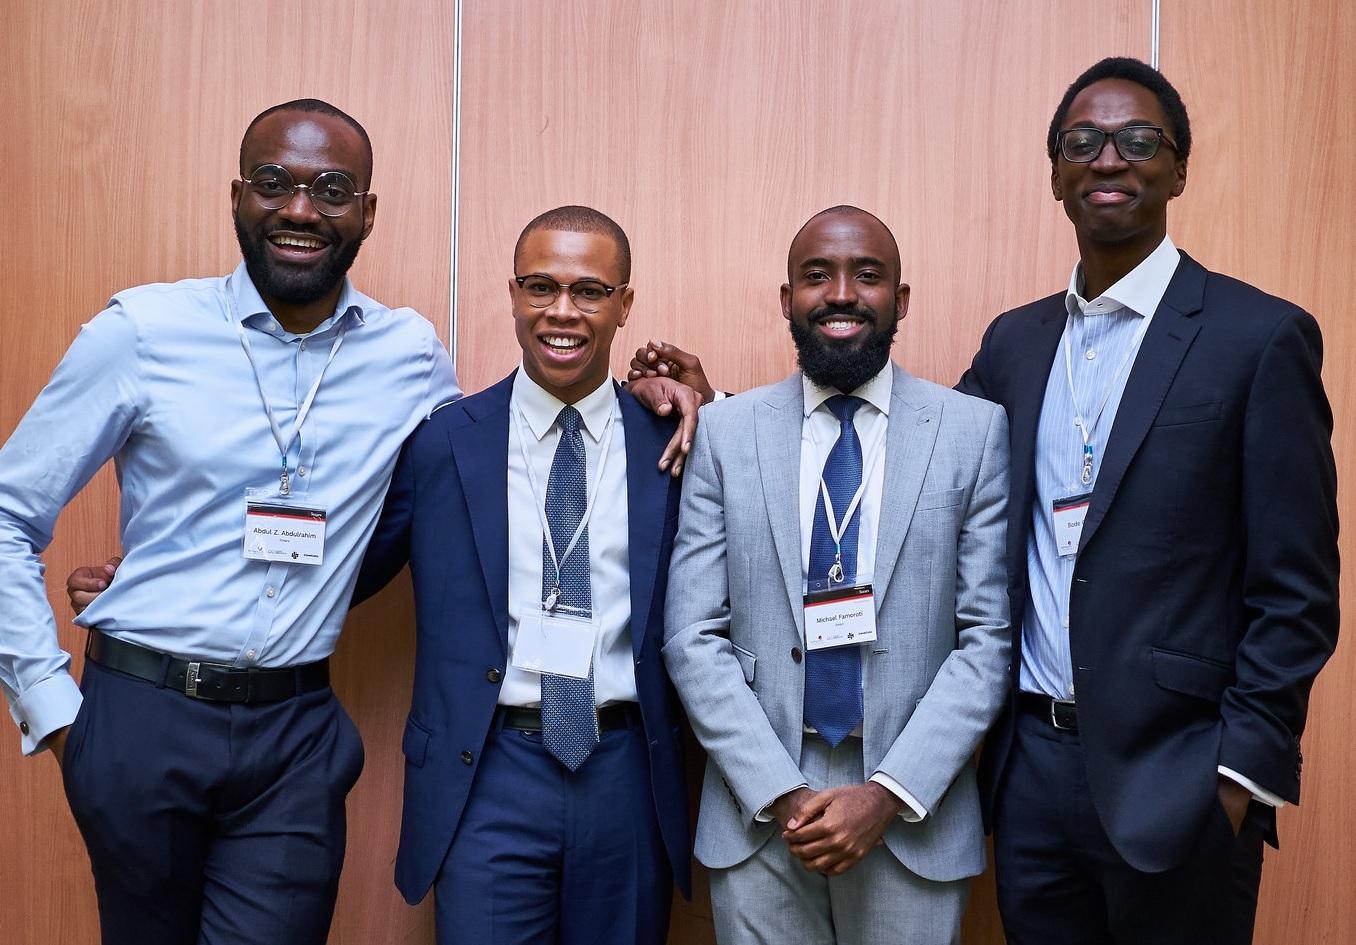 Nigerian media company, Stears raises $600,000 seed round funding